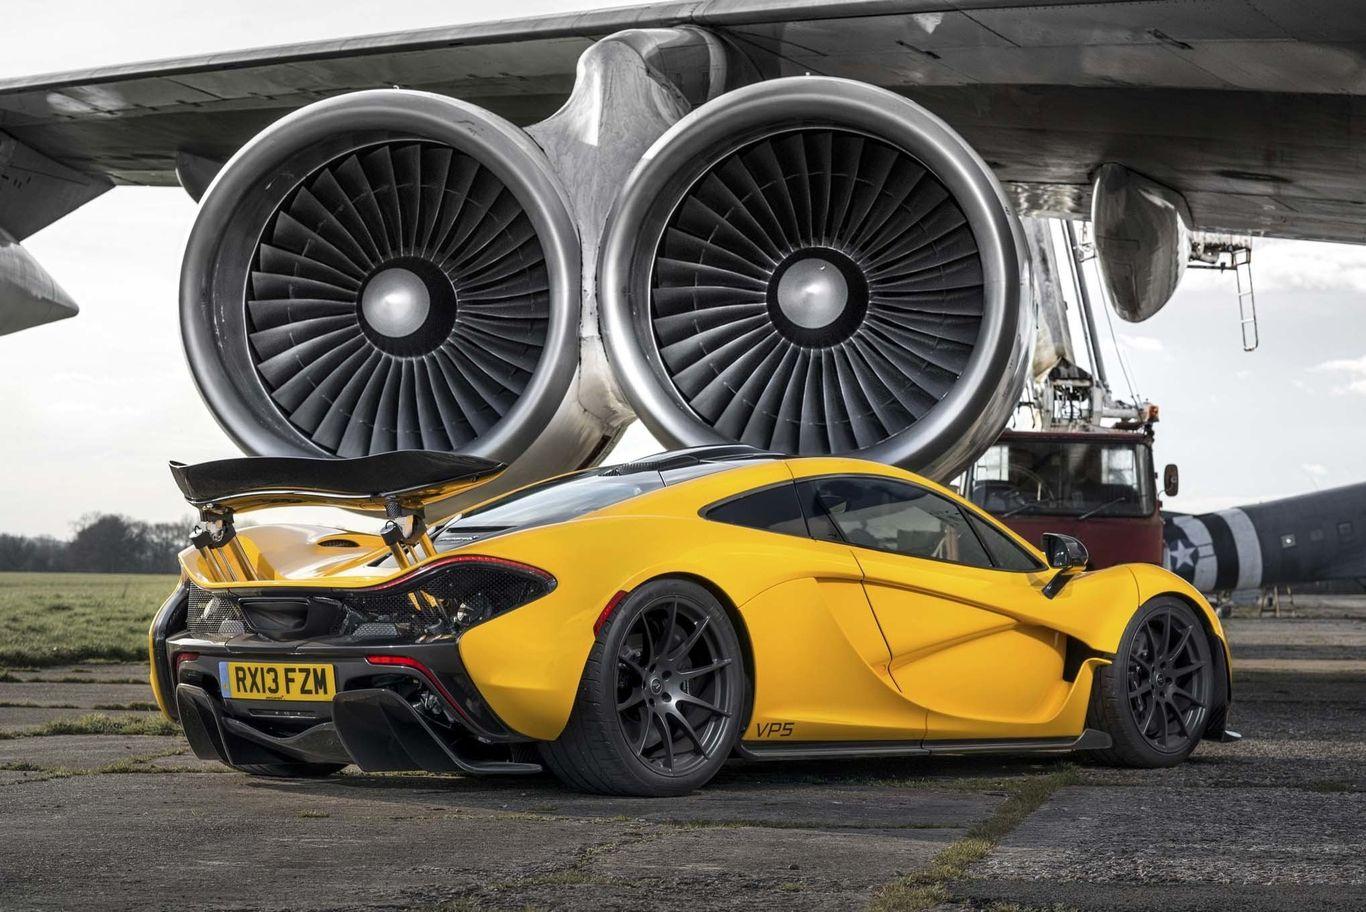 Mclaren - McLaren Could Build An All-Electric P1 Successor - News